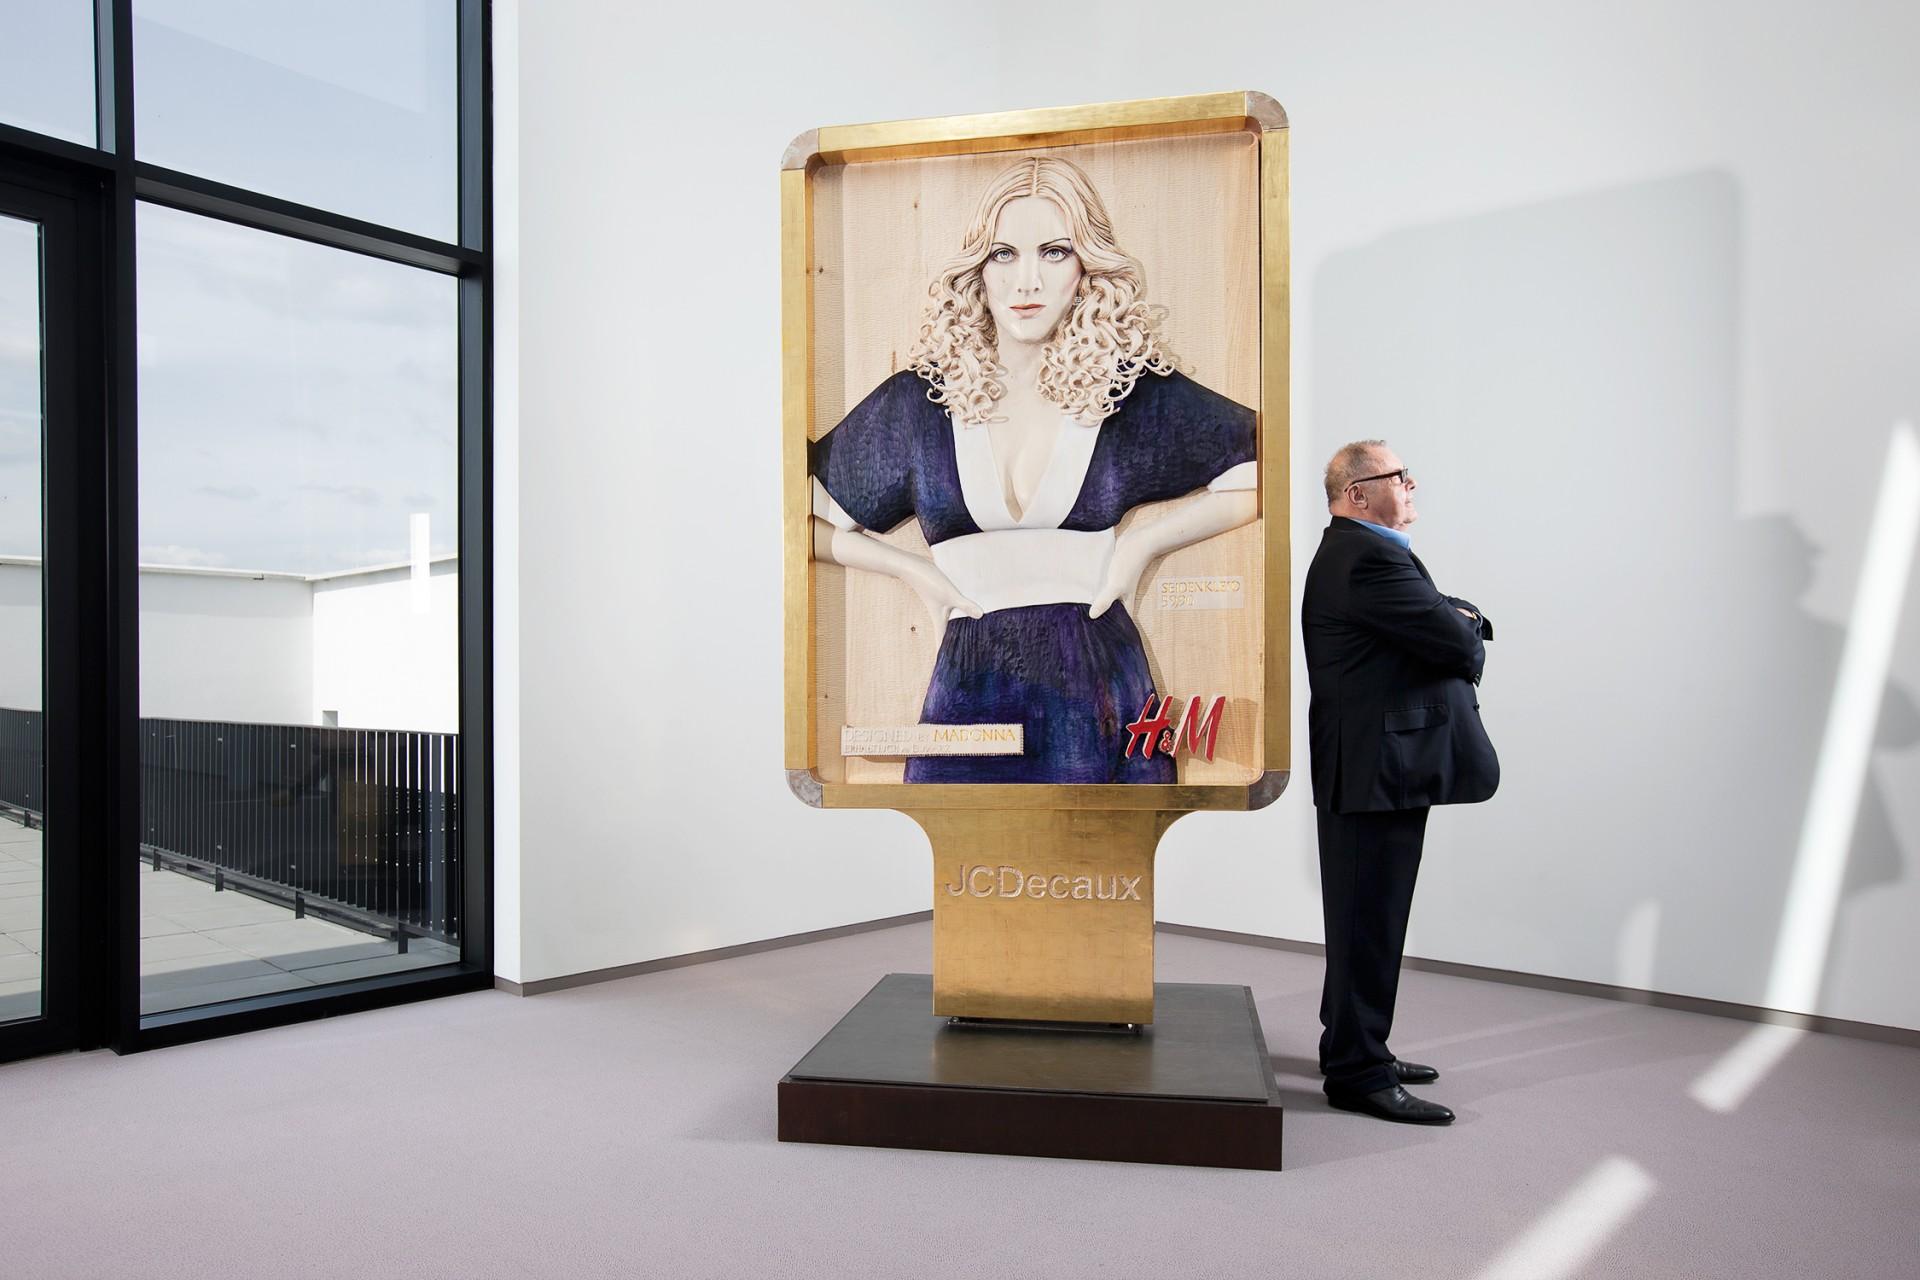 AVANTGAND - Zoob: Hugo Voeten <br/> Madonna / Plakatvitrine by Marc Fromm